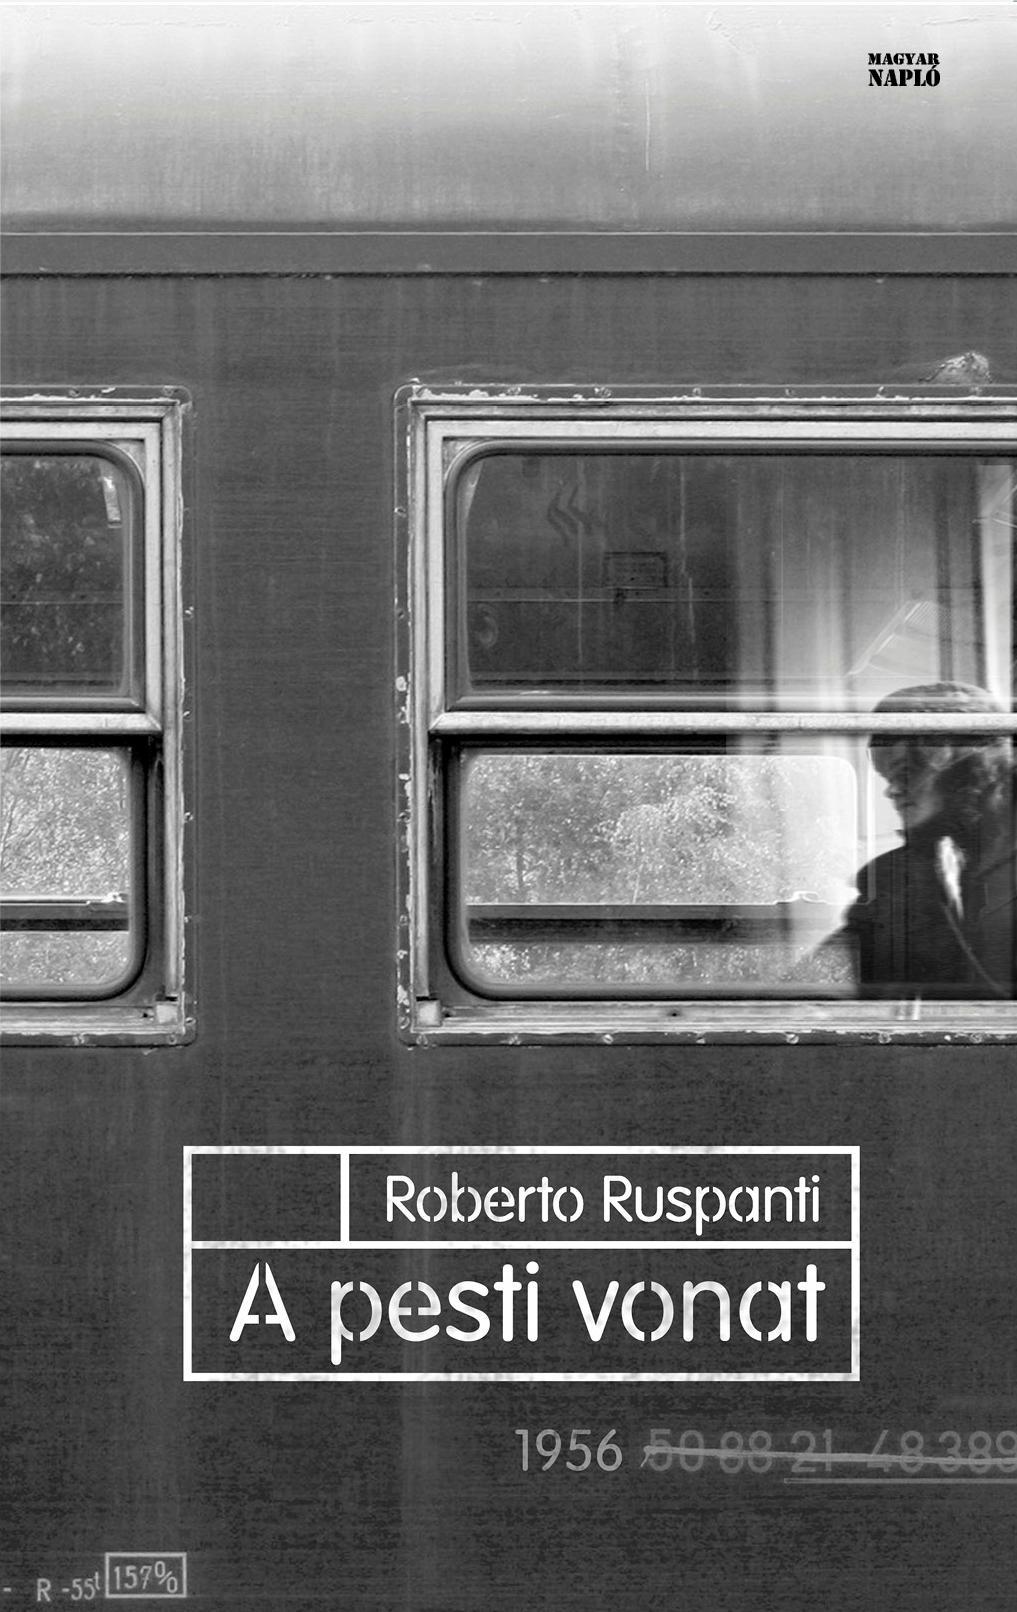 RUSPANTI, ROBERTO - A PESTI VONAT